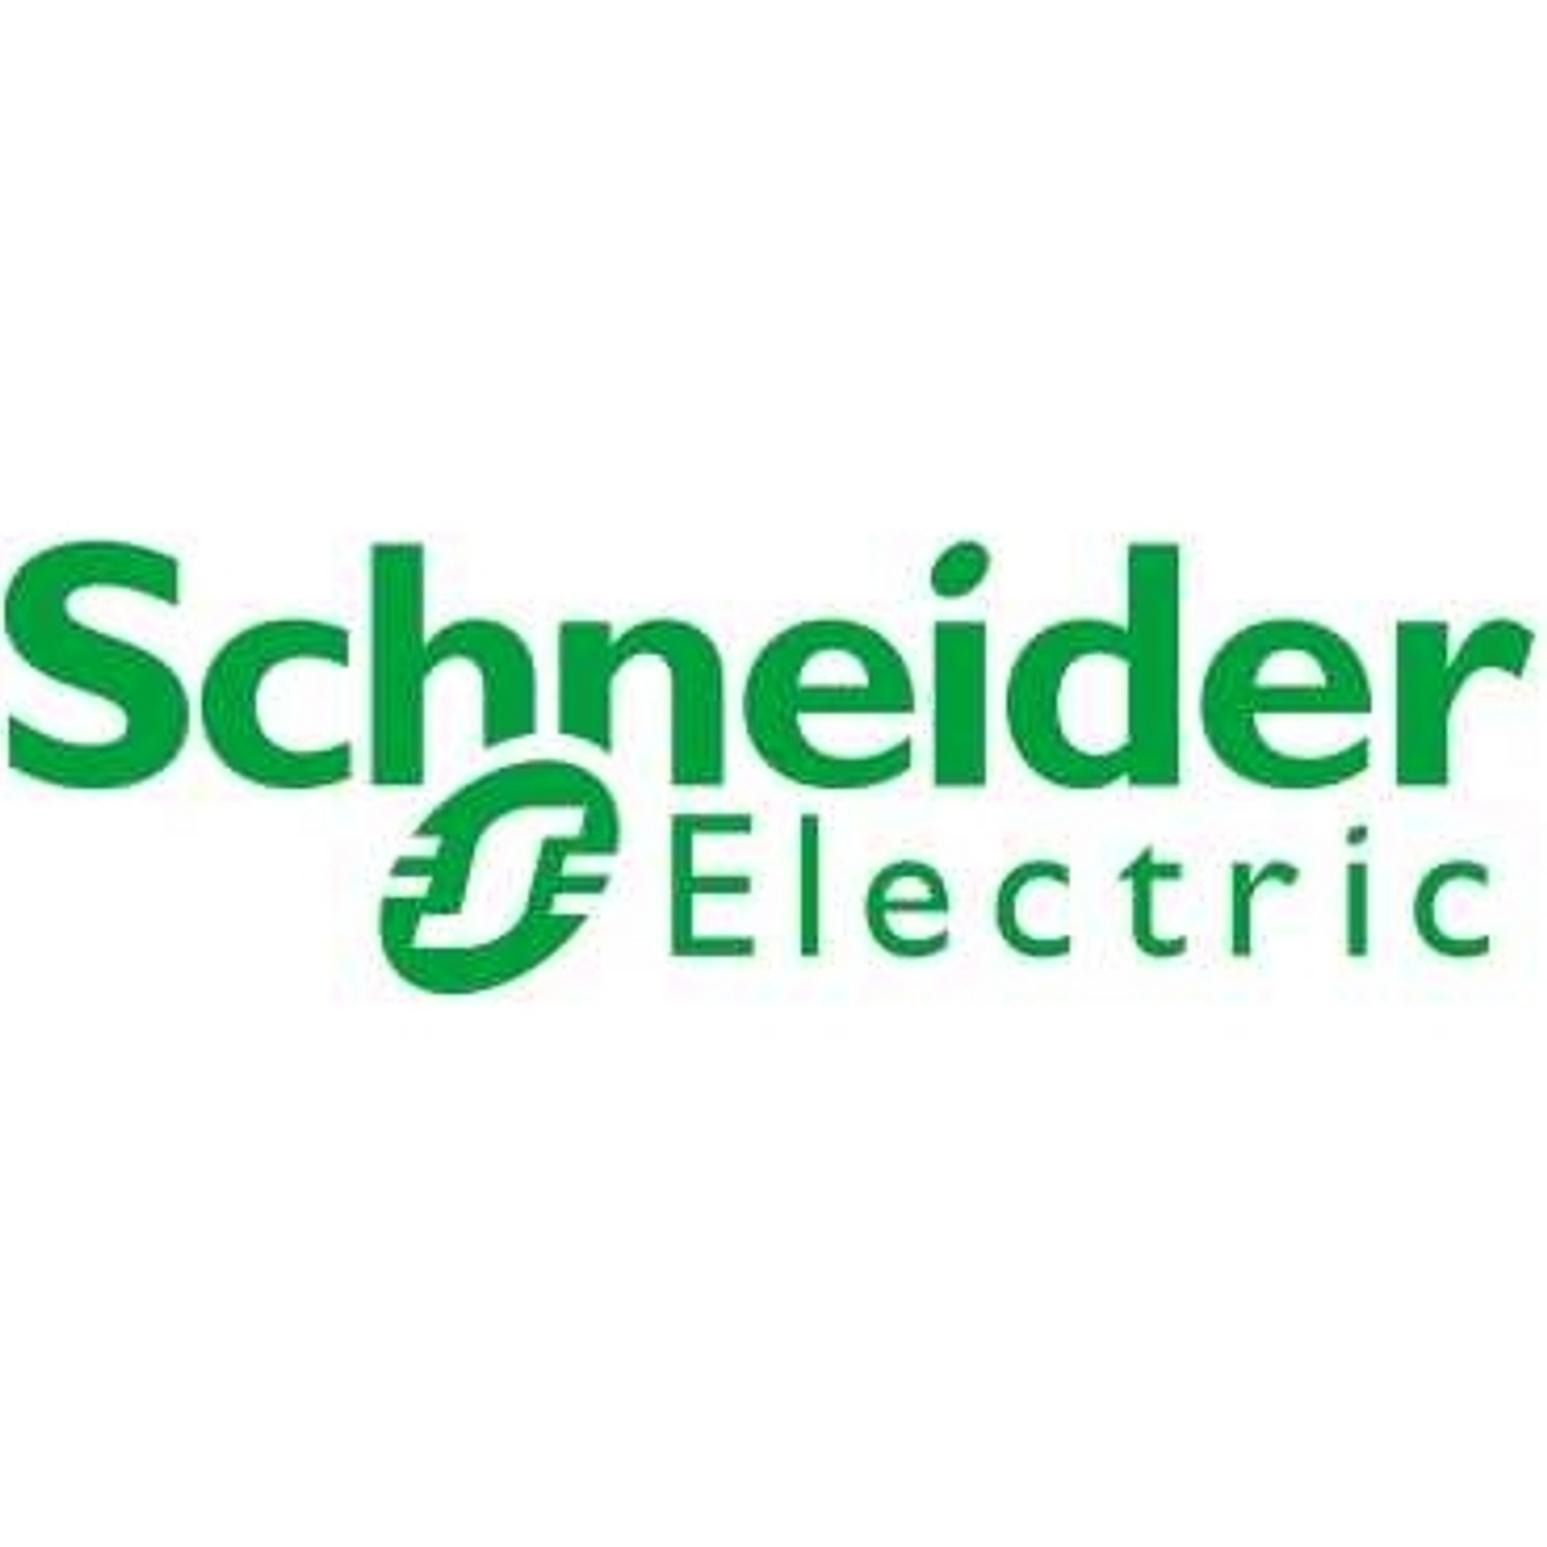 Mengenal Schneider Electric Indonesia, Spesialis Manajemen Energi dan Otomatisasi